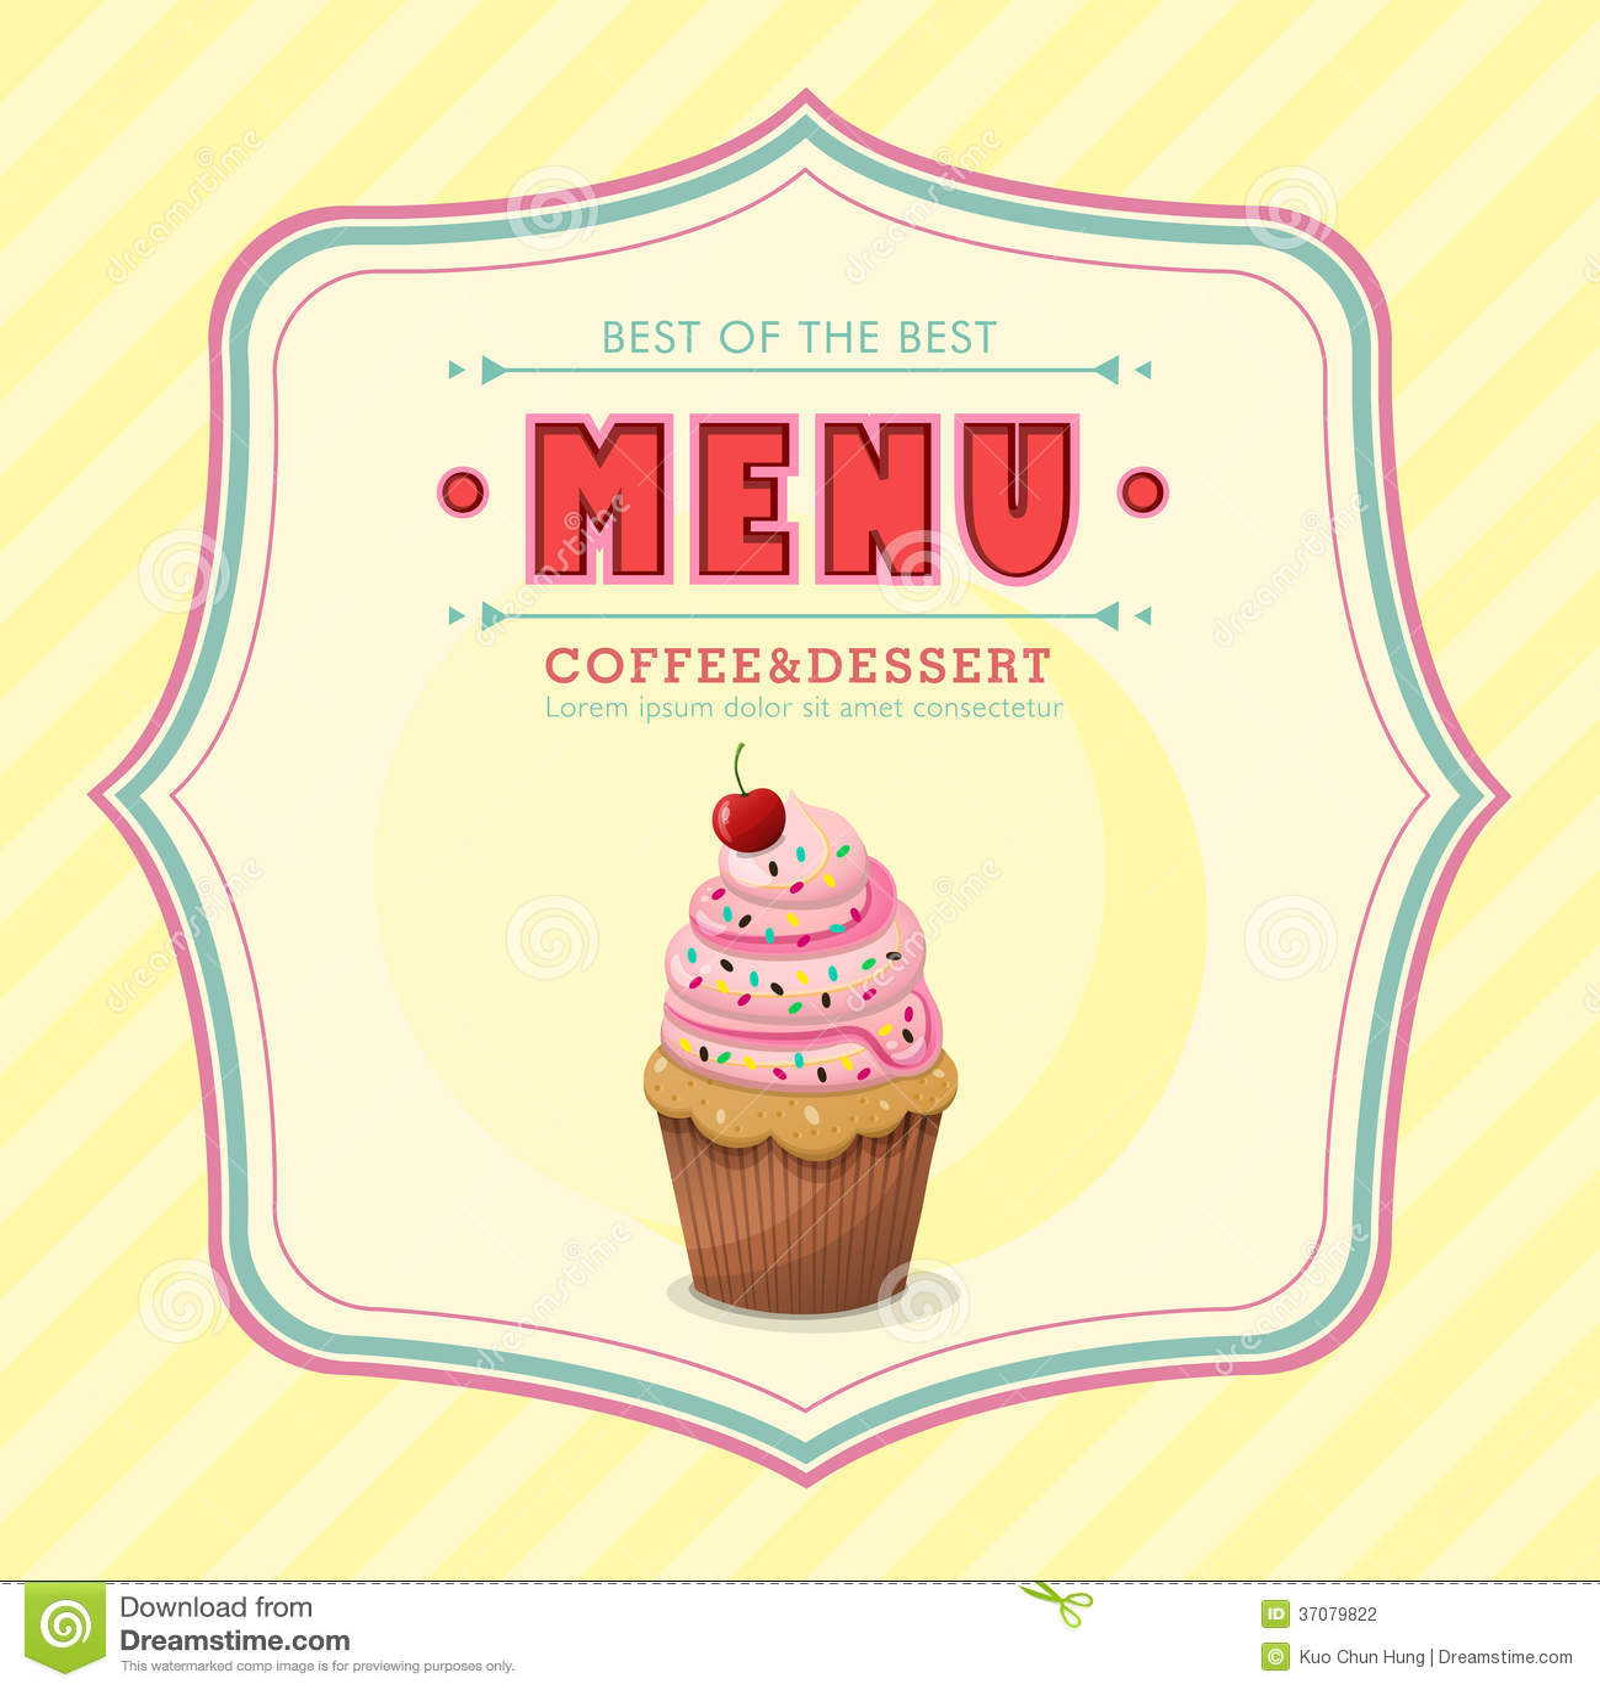 Ice cream menu cover stock vector. Illustration of creative - 37079822